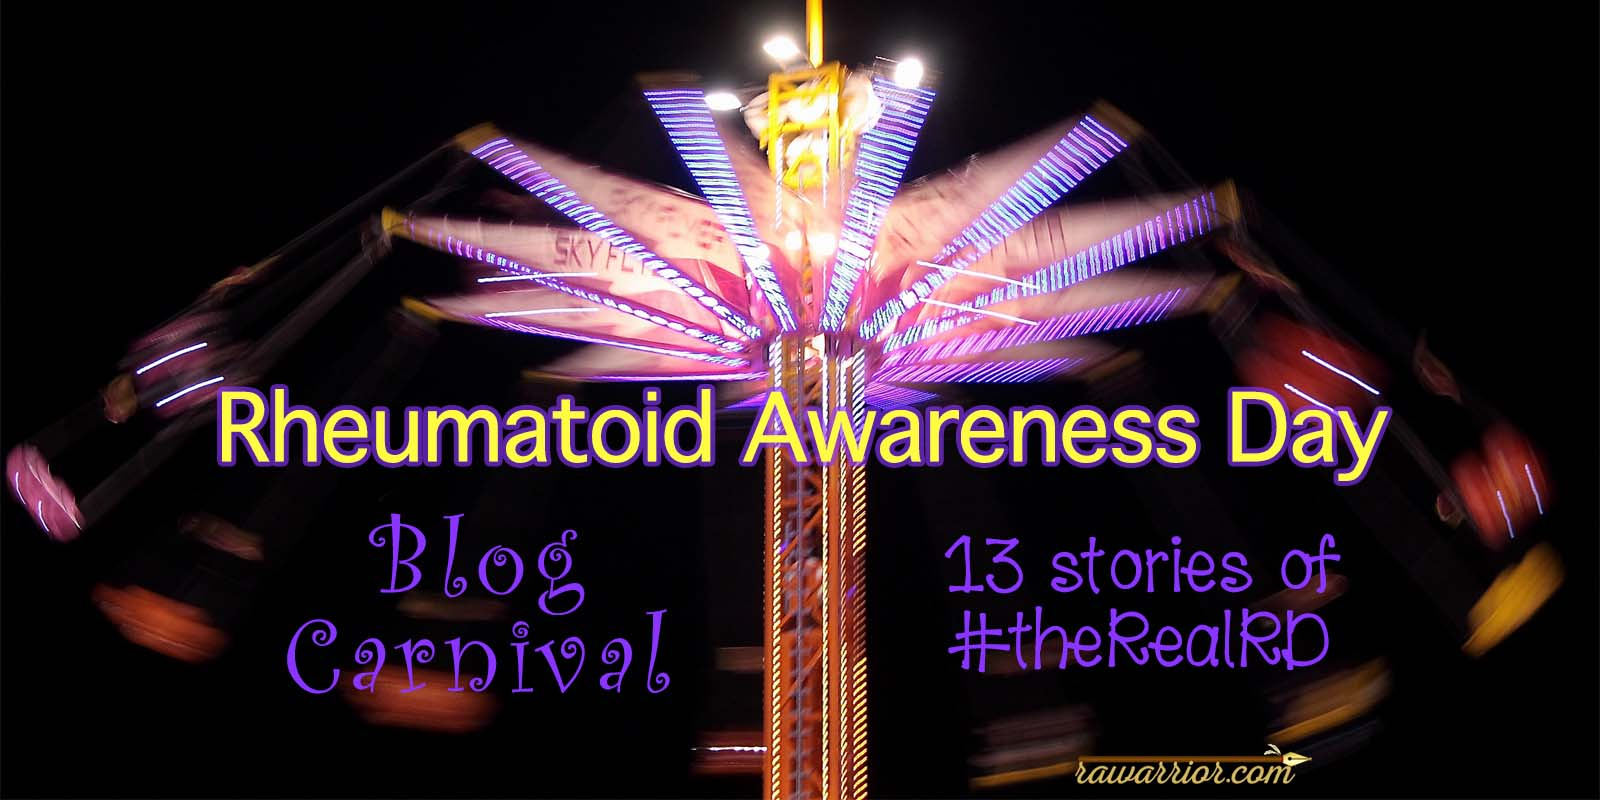 Rheumatoid Arthritis Day Blog Carnival